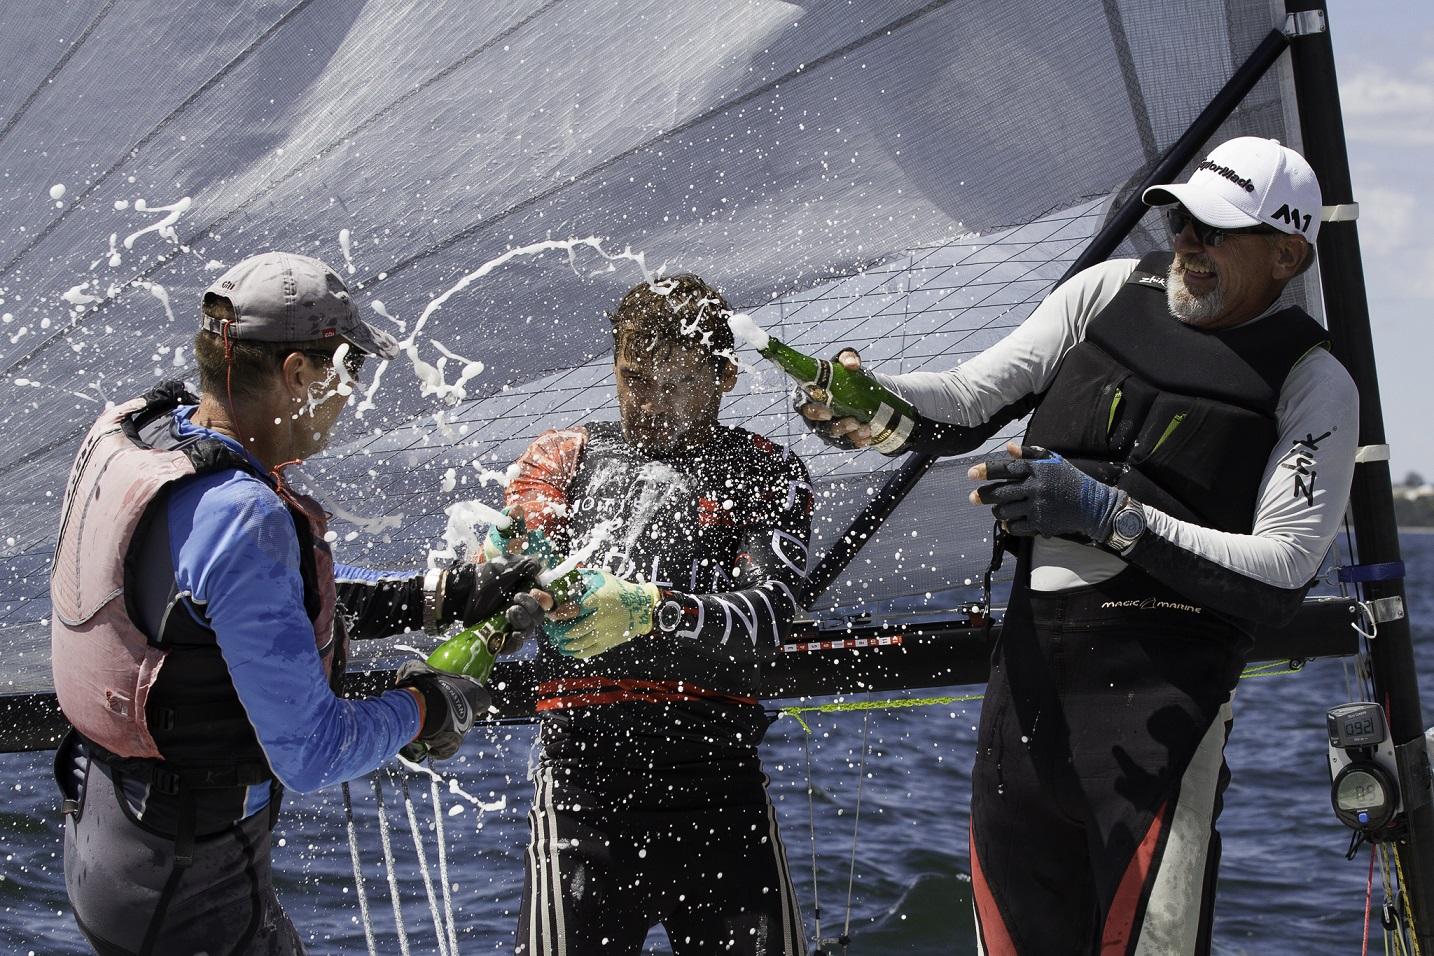 Champagne-celebration-for-Nick-Jerwood-son-Matt-and-Brian-de-Vries---Bernie-Kaaks-pic